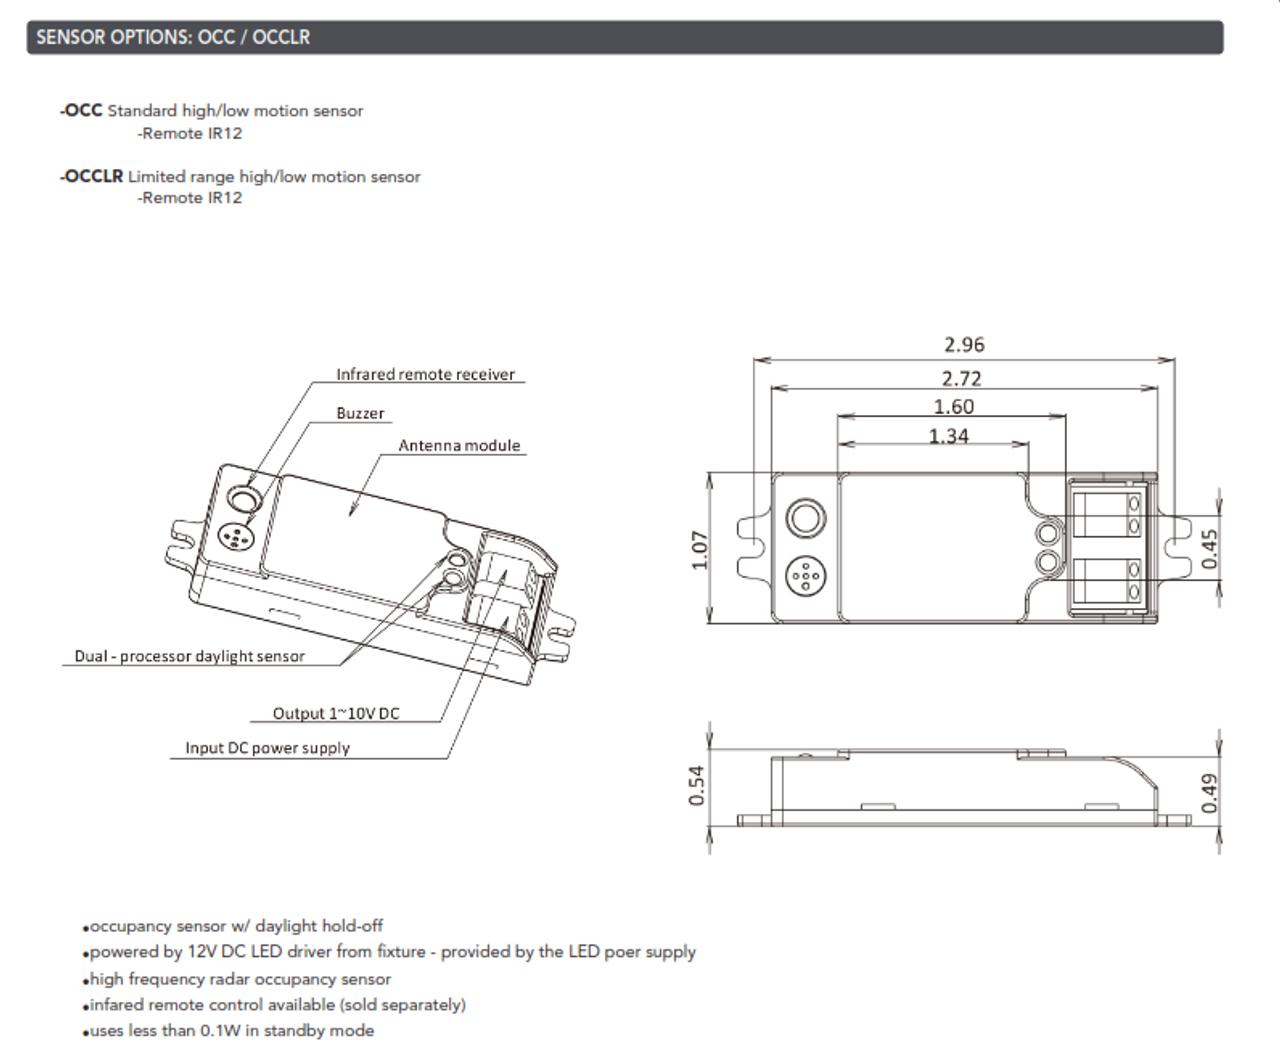 Light Efficient Design LEDCR and LEDSR-WALL AND CEILING RETROFIT KITS